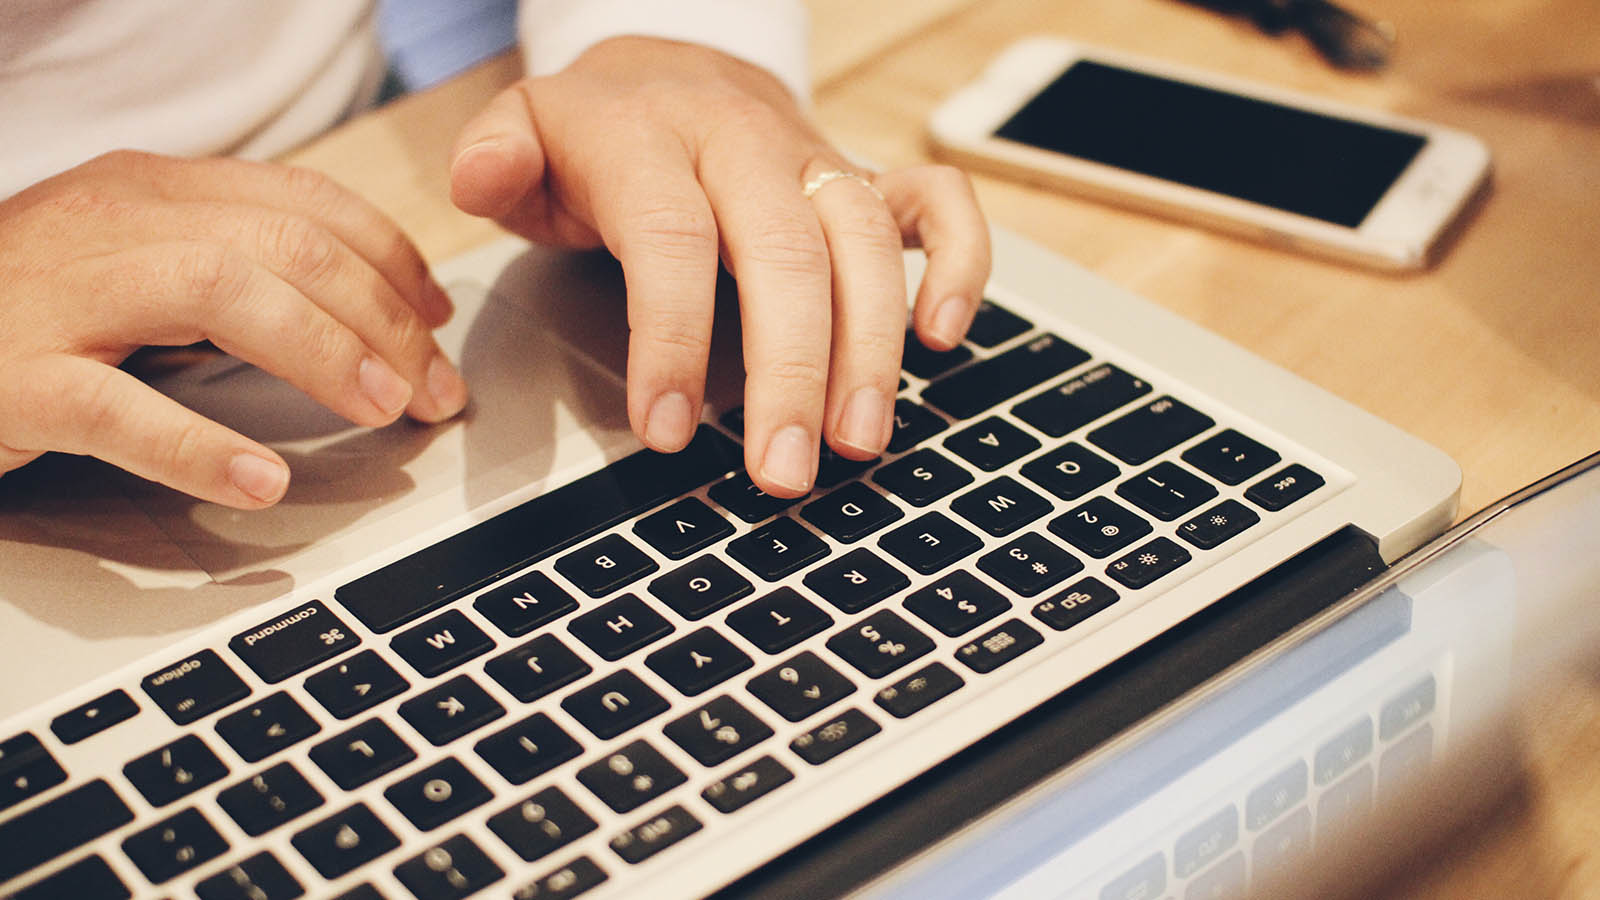 Structuralia ofrece cursos gratis online para capacitarse desde casa